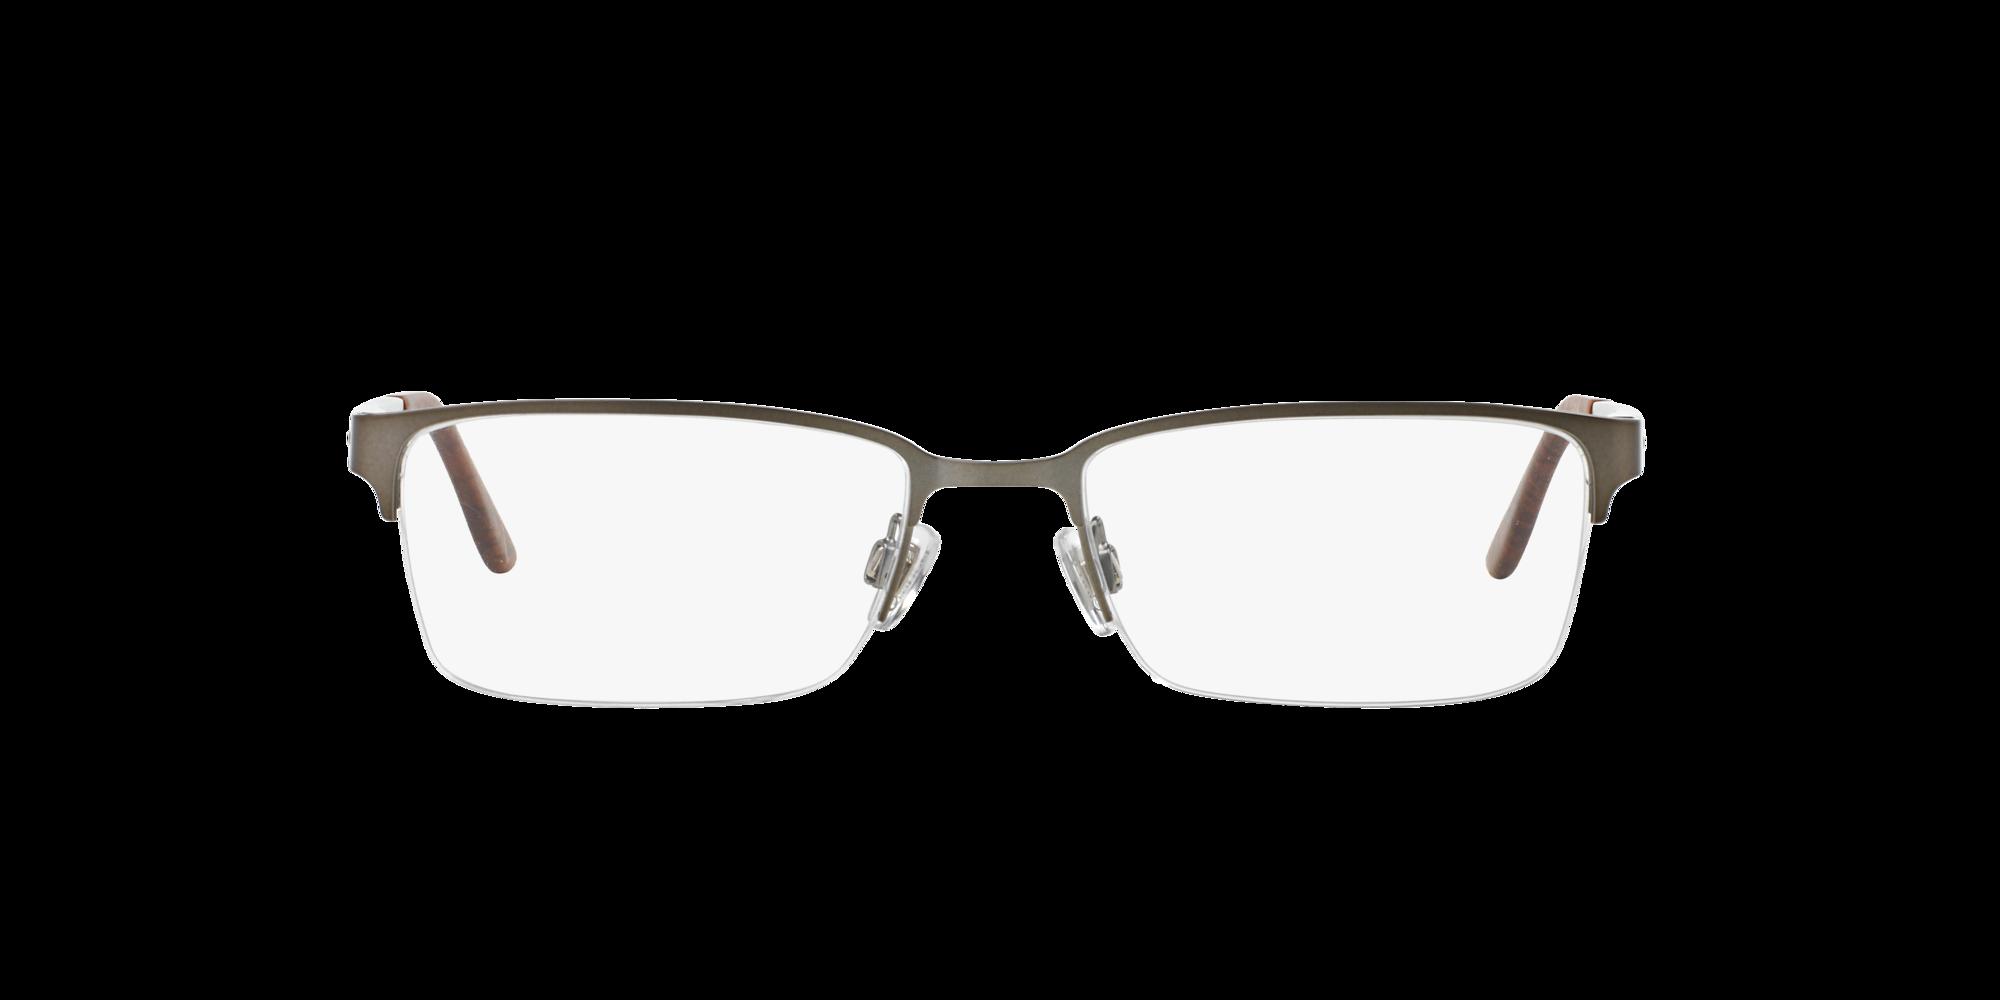 Image for RL5089 from LensCrafters | Glasses, Prescription Glasses Online, Eyewear